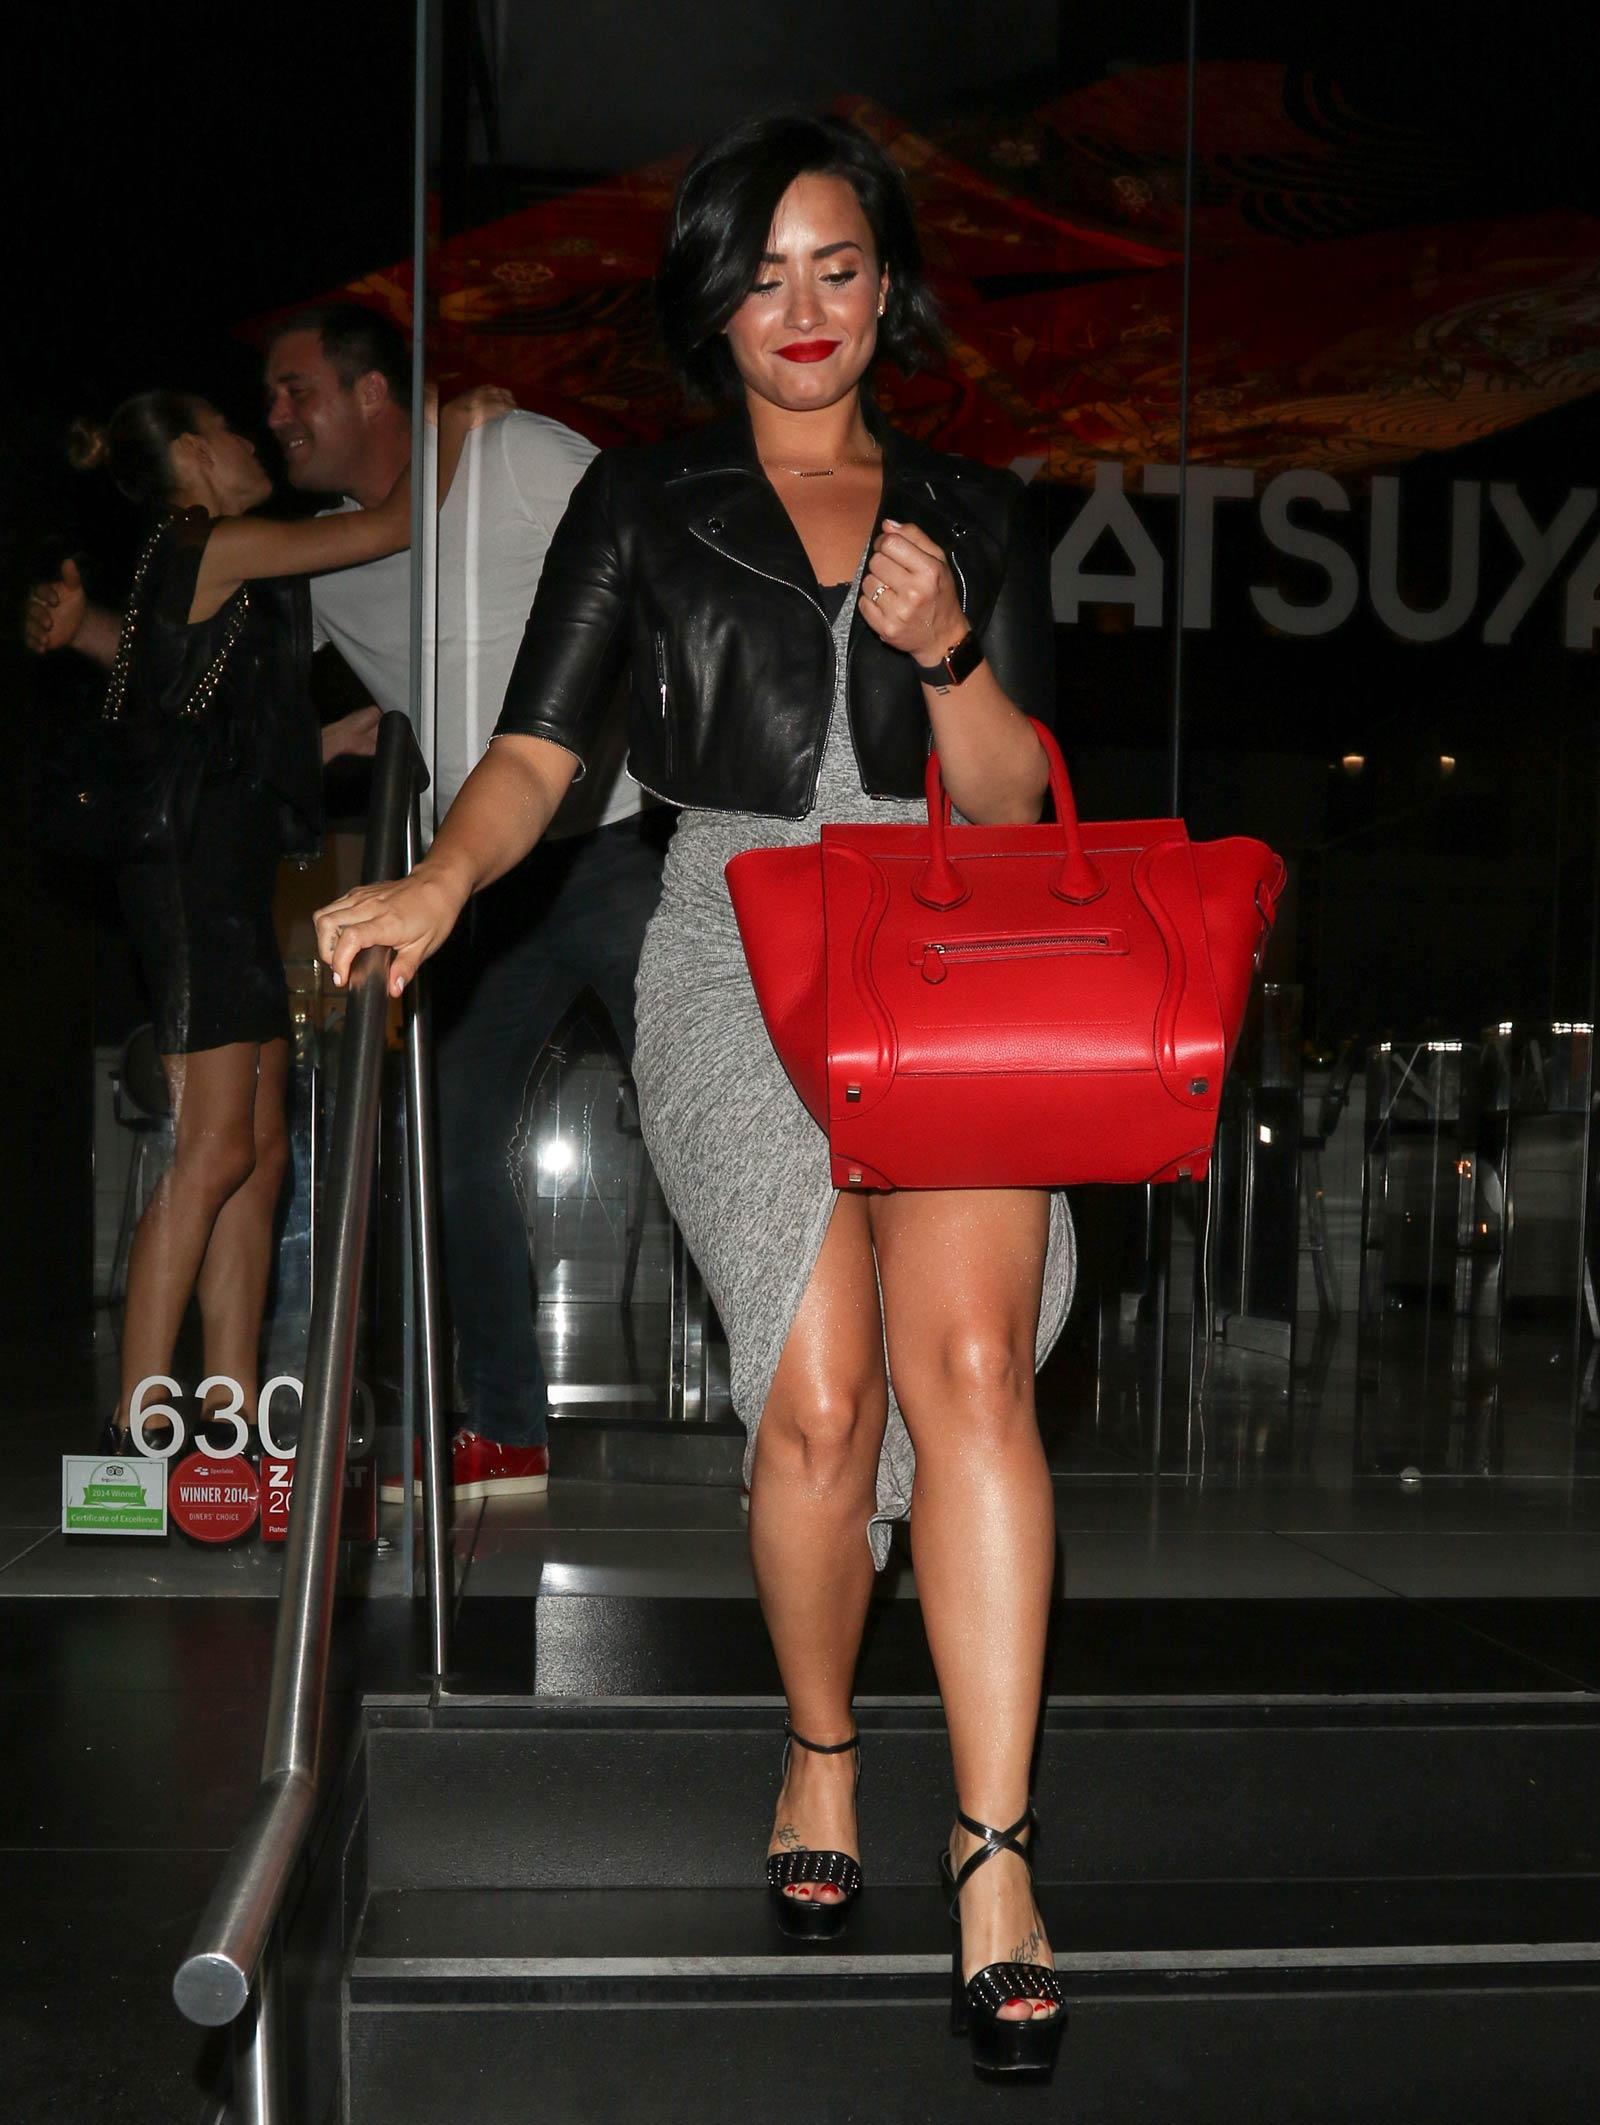 Demi Lovato leaving Katsuya Restaurant